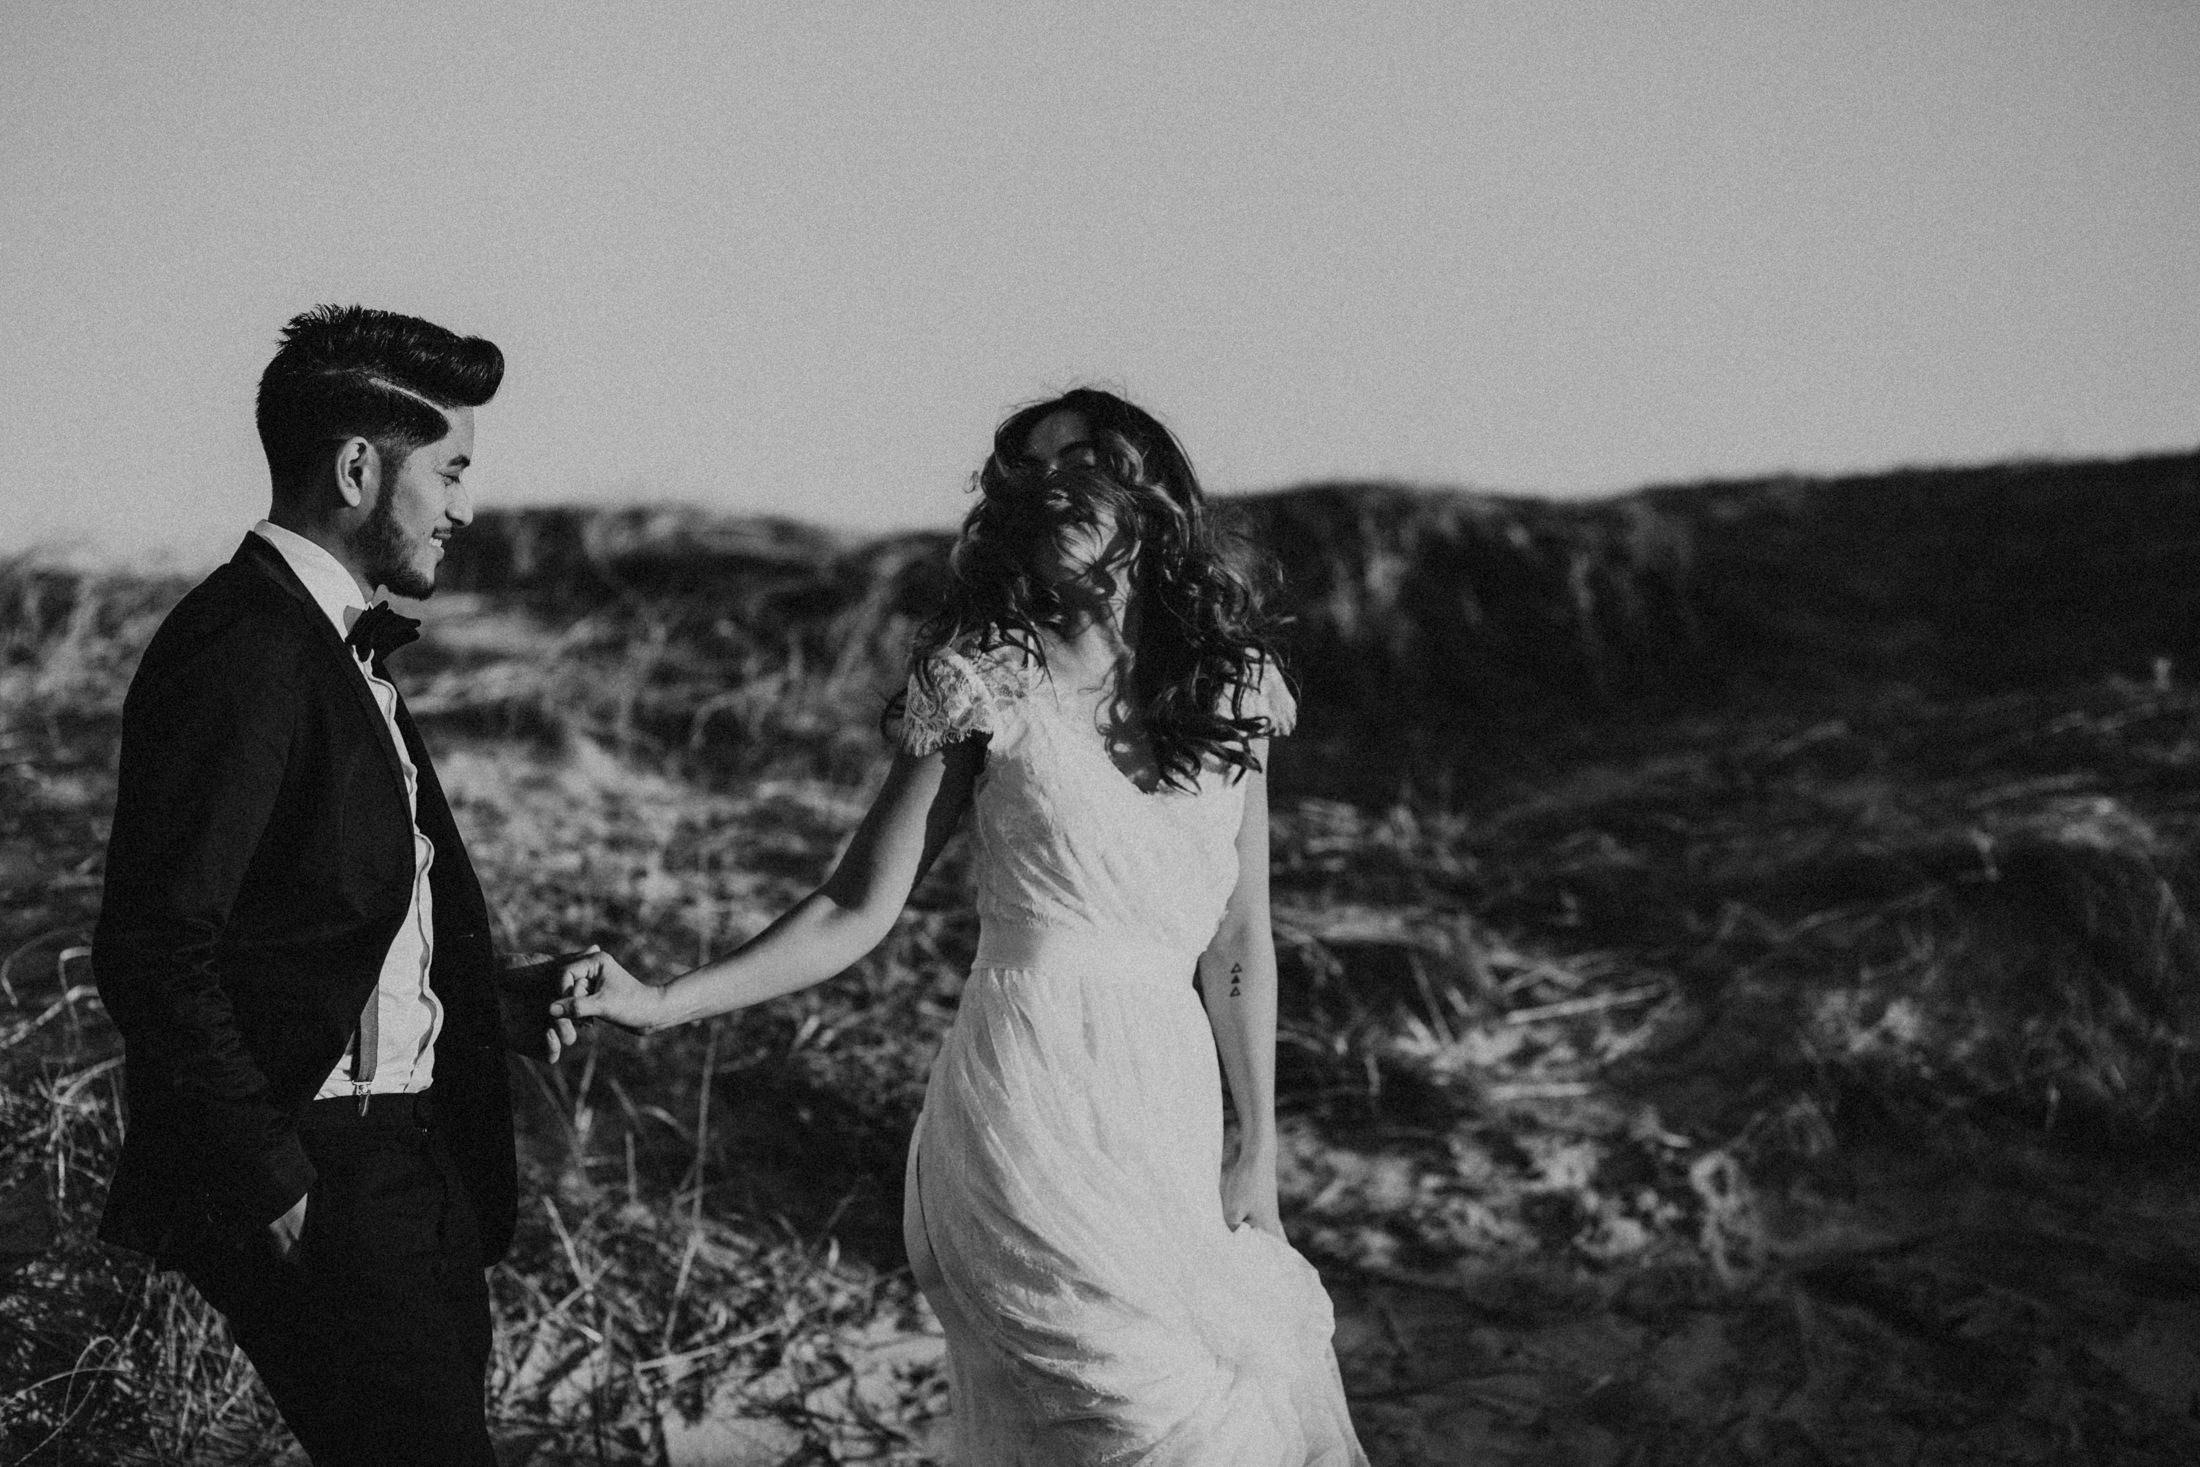 Wedding_Photographer_Mallorca_Daniela-Marquardt_Photography_CanaryIslands_Lanzarote_Iceland_Tuskany_Santorini_Portugal_Schweiz_Austria_Bayern_Elopement_Hochzeitsfotograf_Norddeichich_42